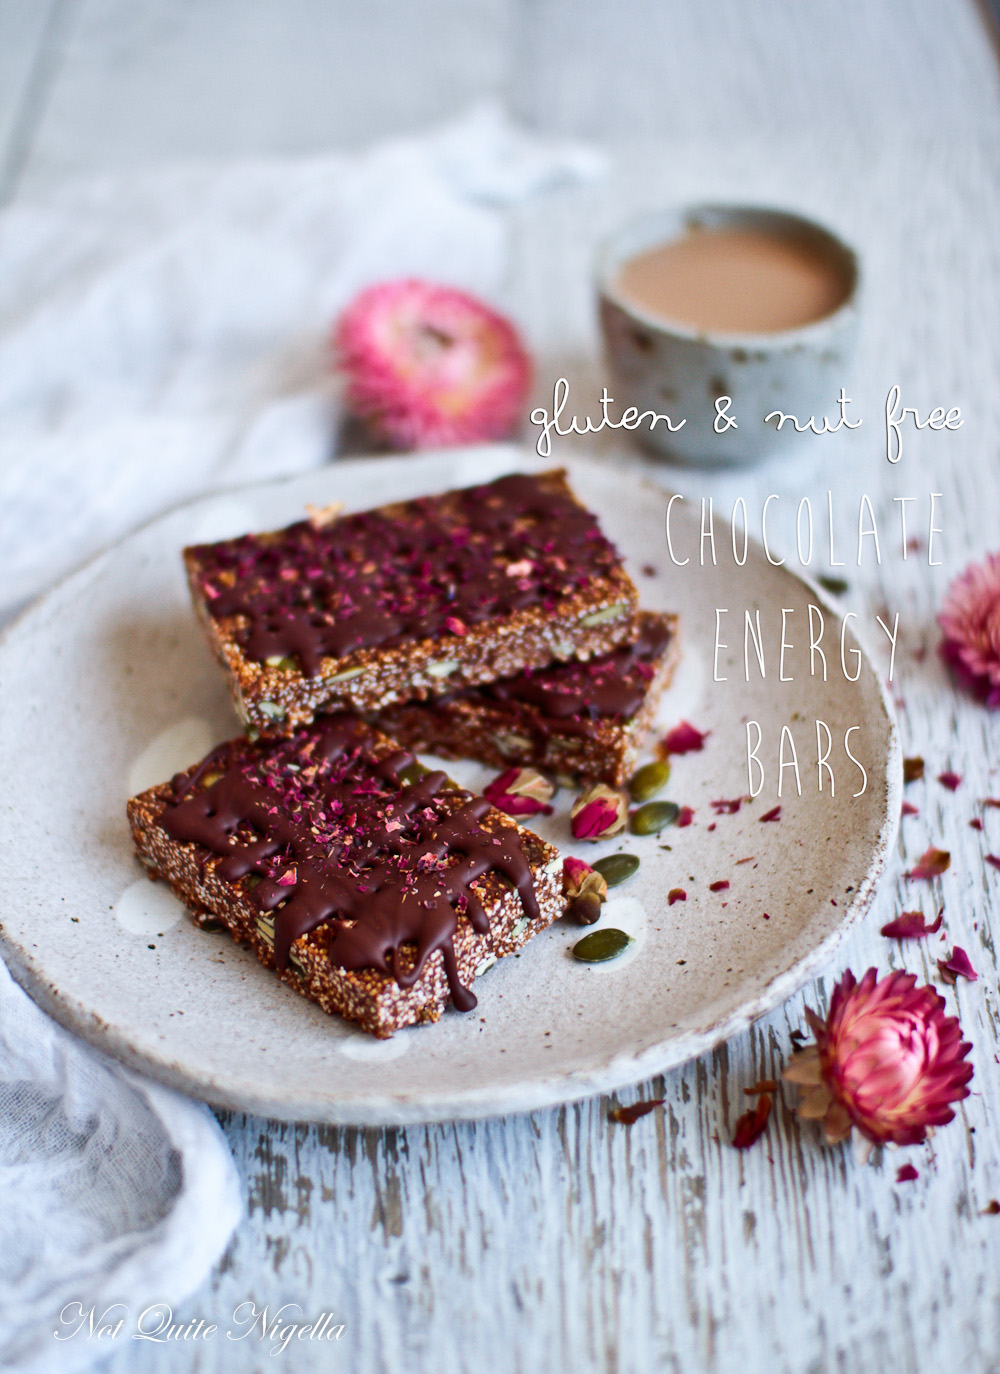 Healthy Dark Chocolate Energy Bars Gluten & Nut Free